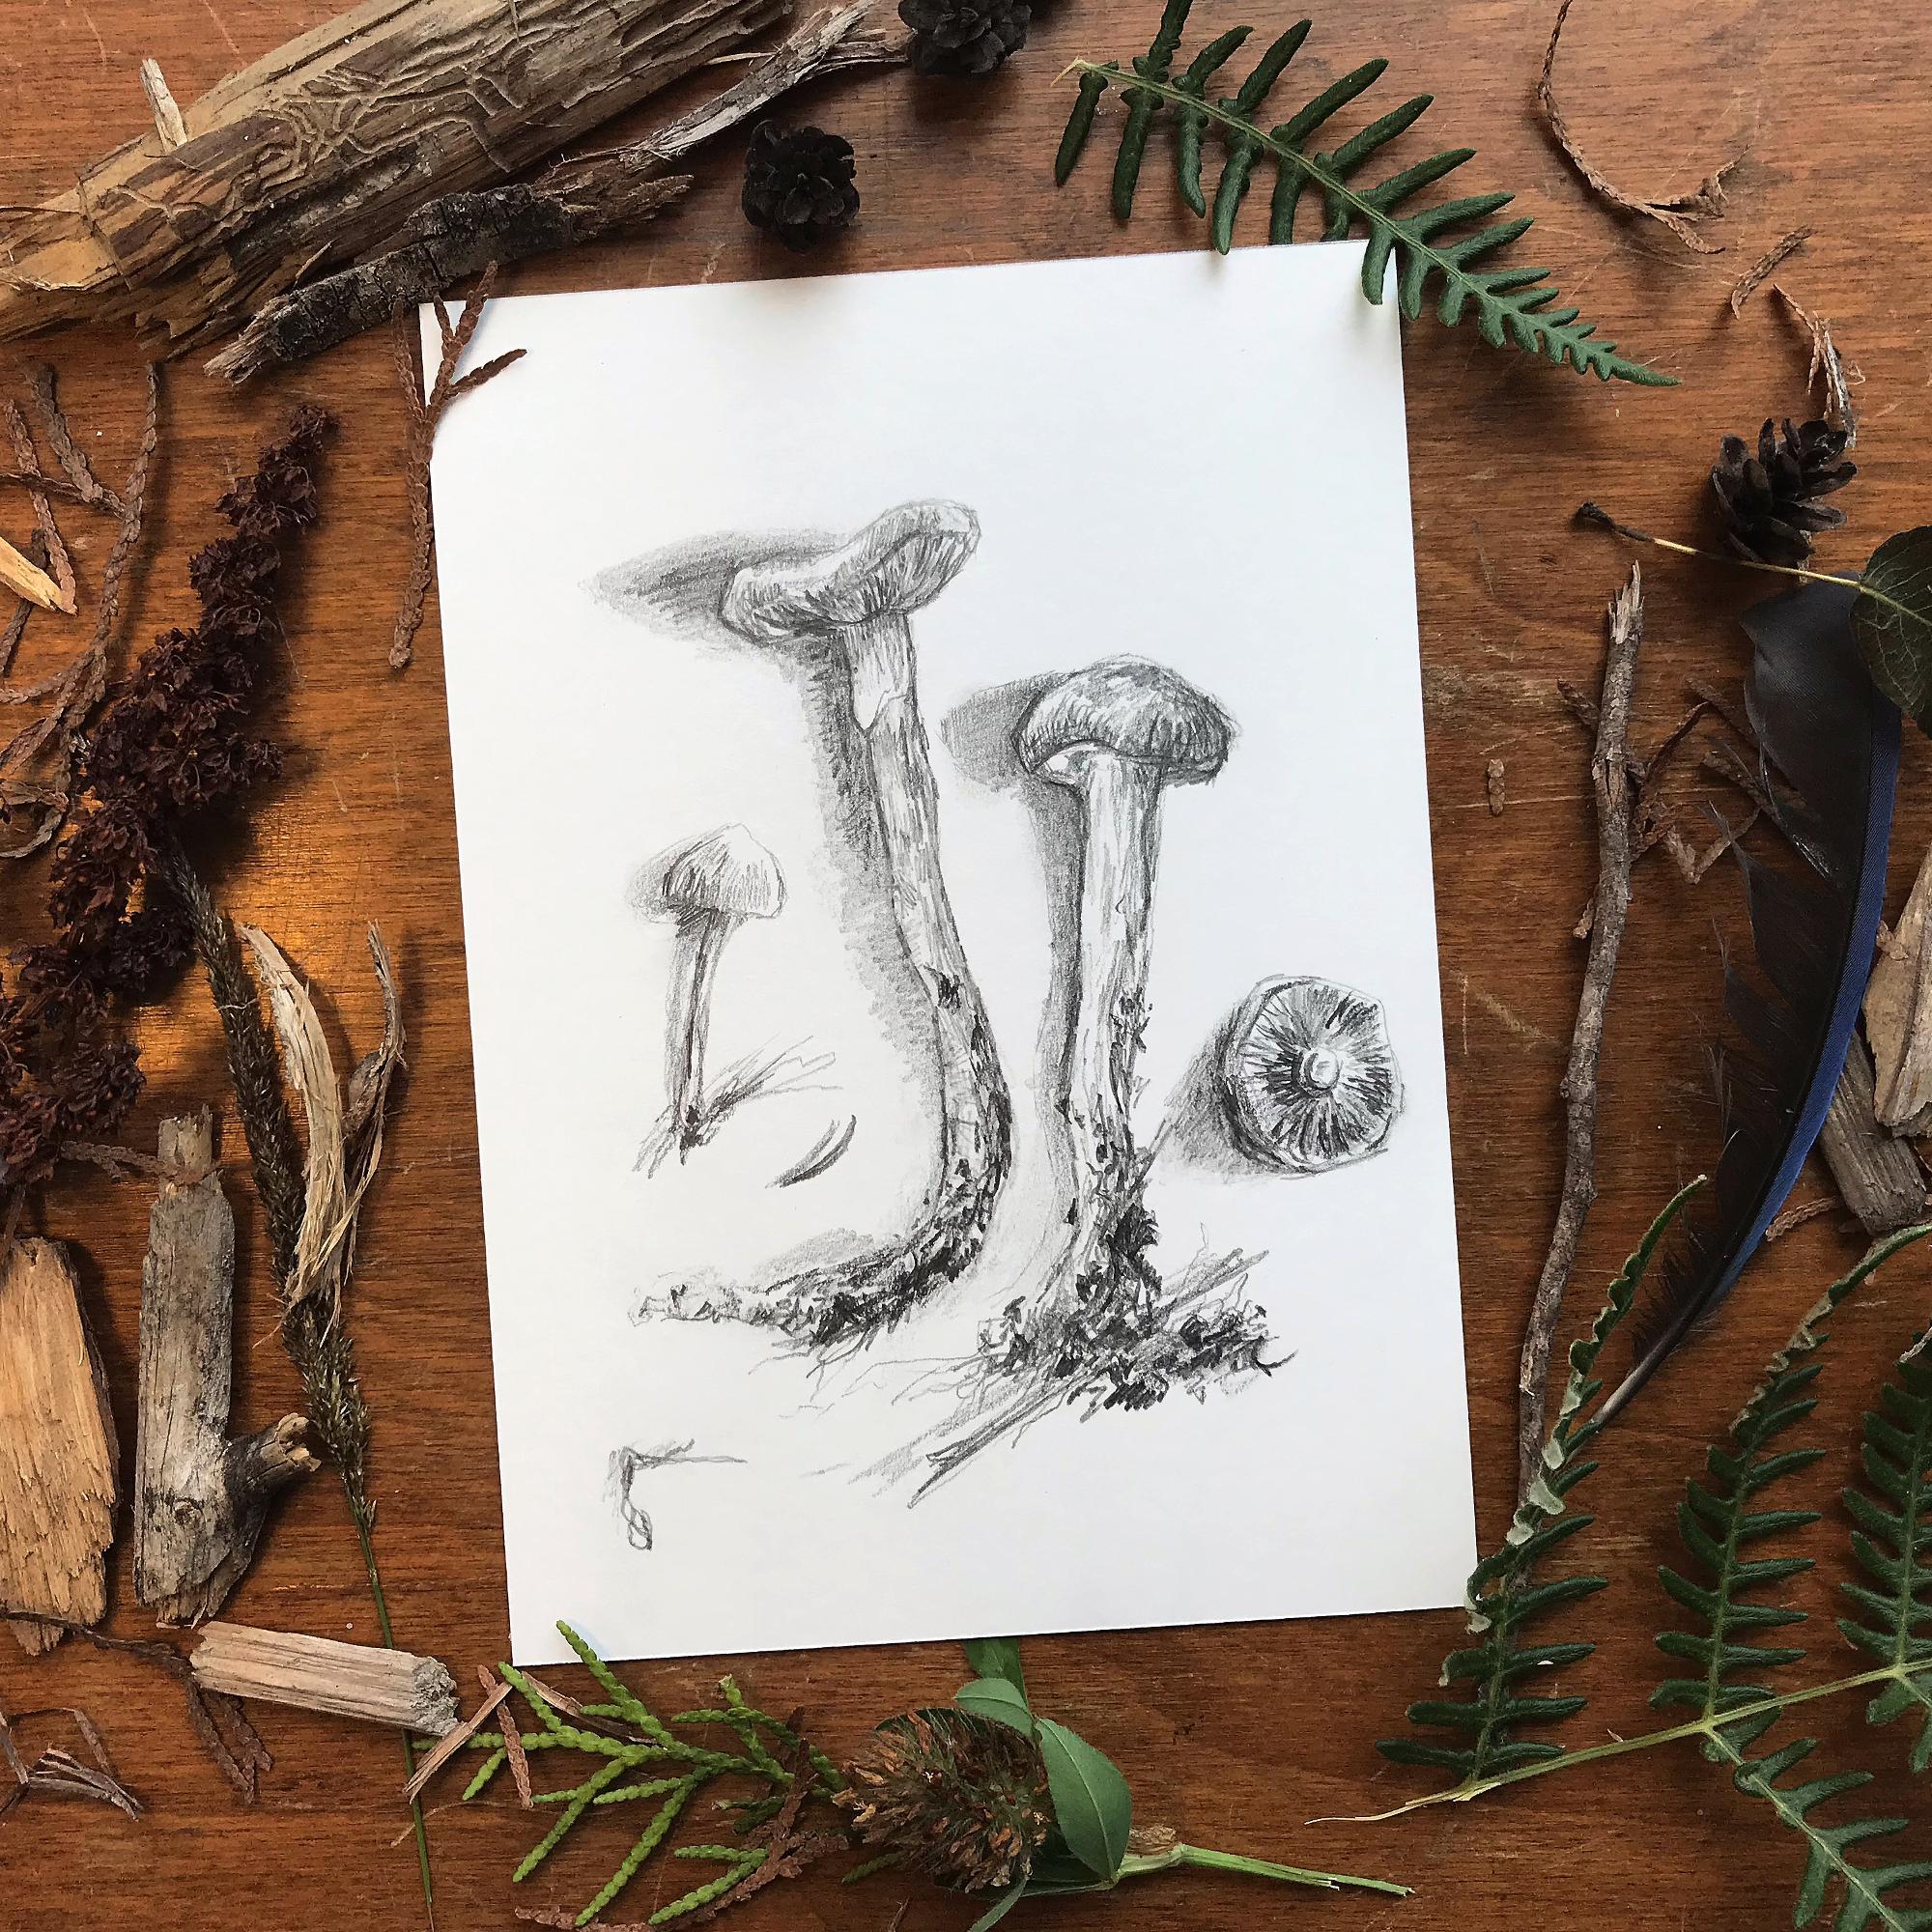 Forest_Finds_3_Nigel_Sutcliffe_web.JPG